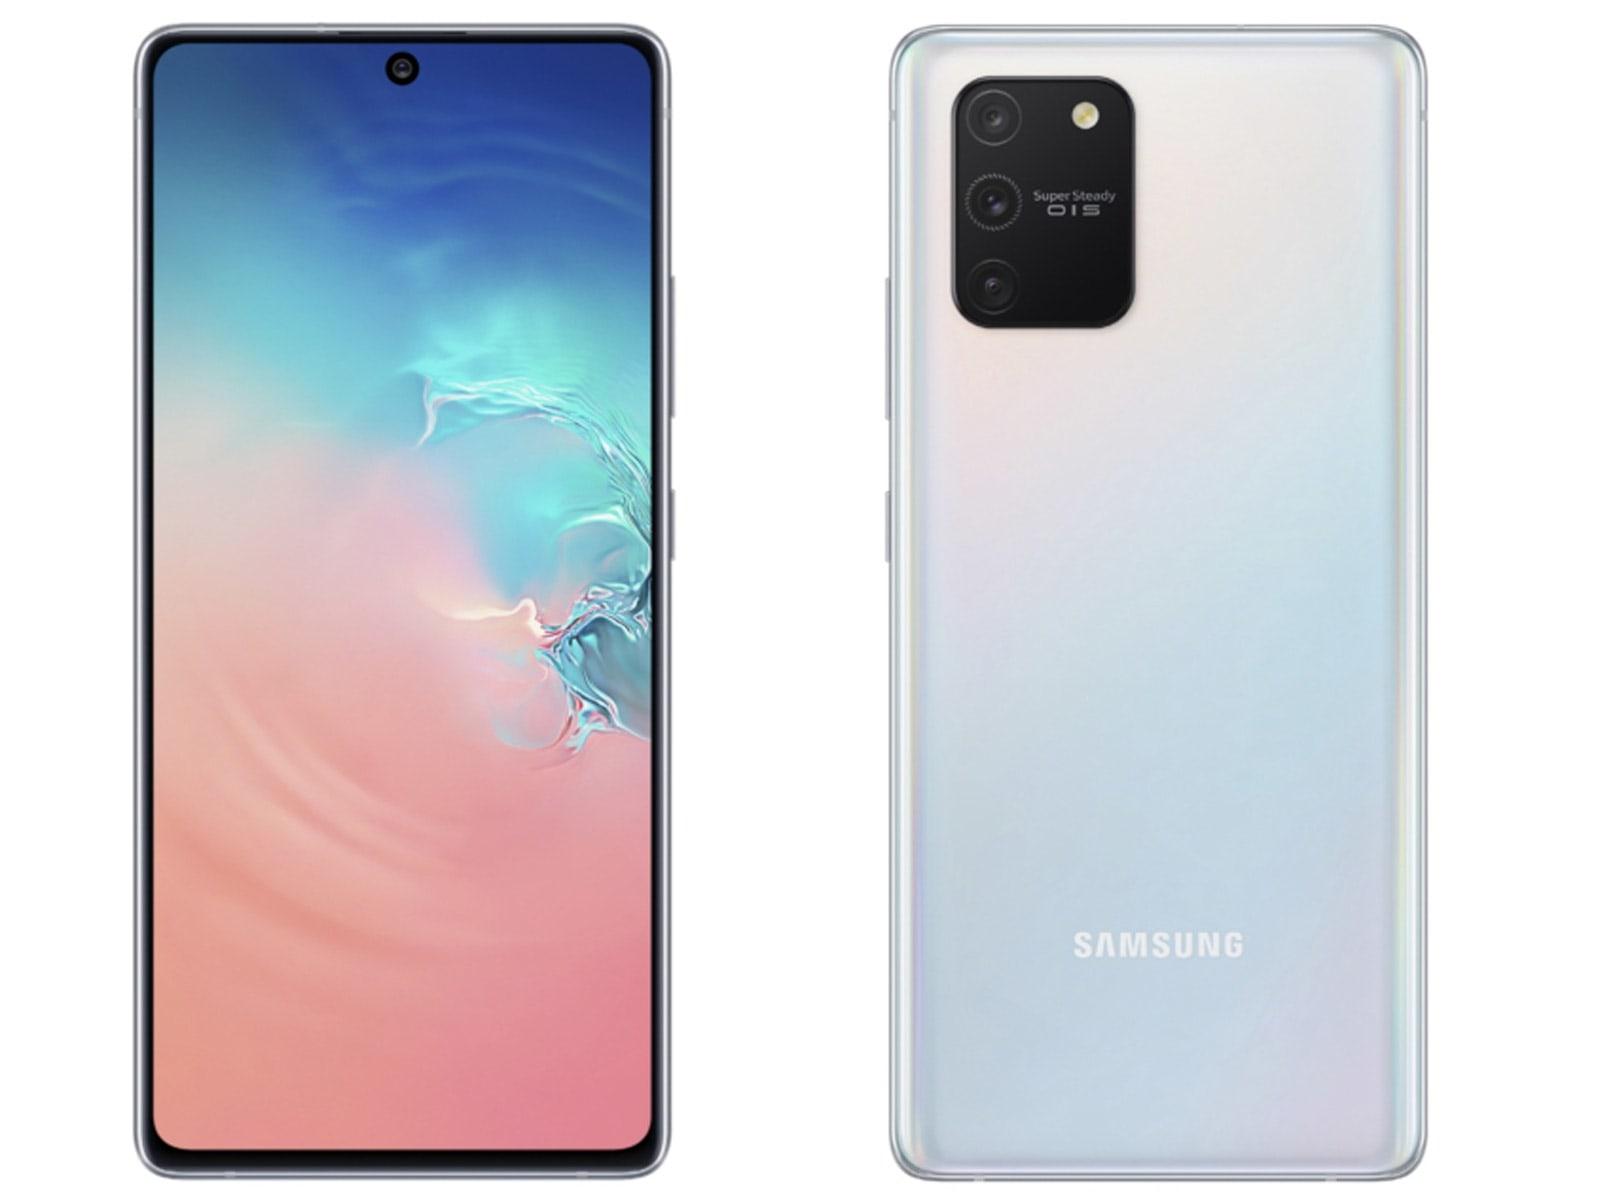 Galaxy S10 Lite